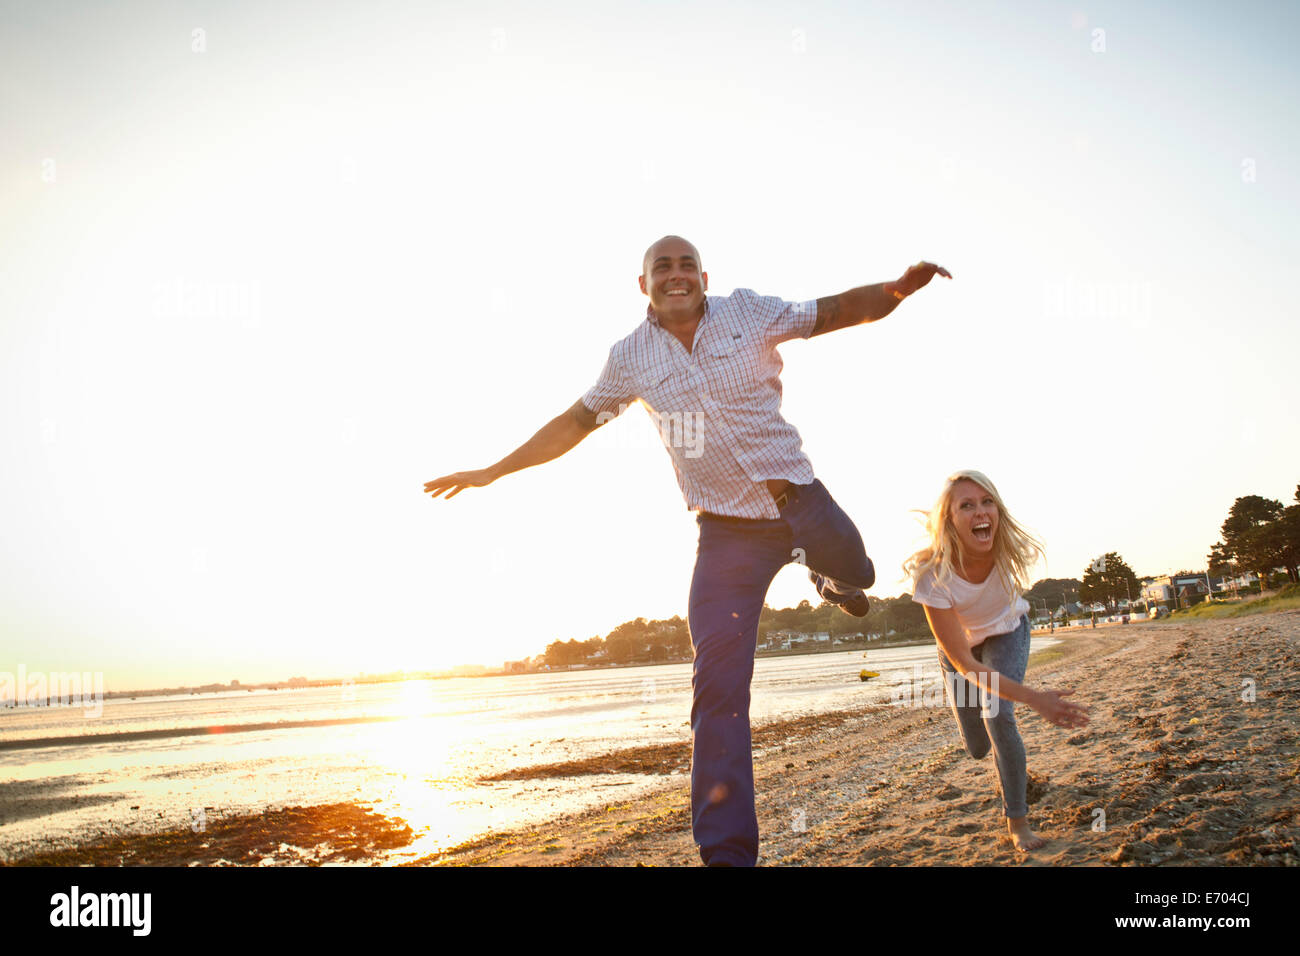 Couple having fun on beach - Stock Image